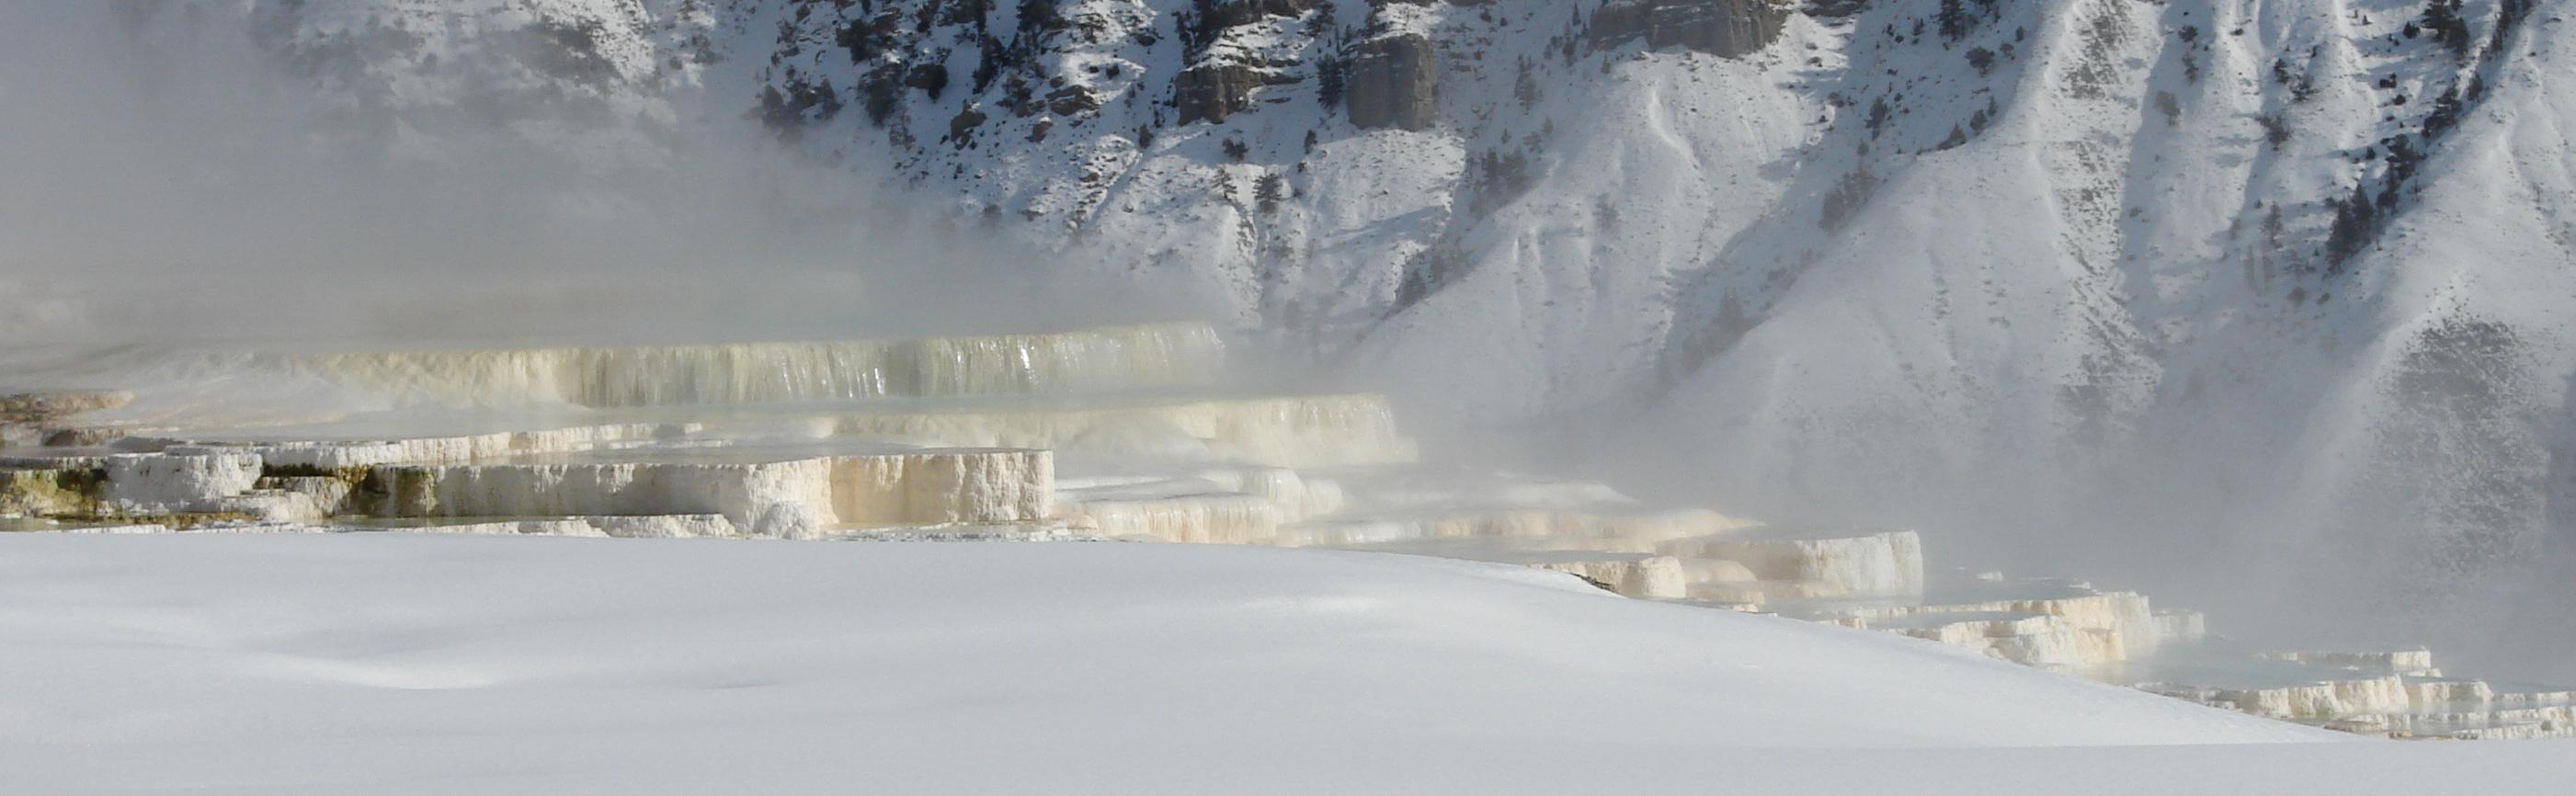 Mammoth Hot Springs | Carl Moore LMT